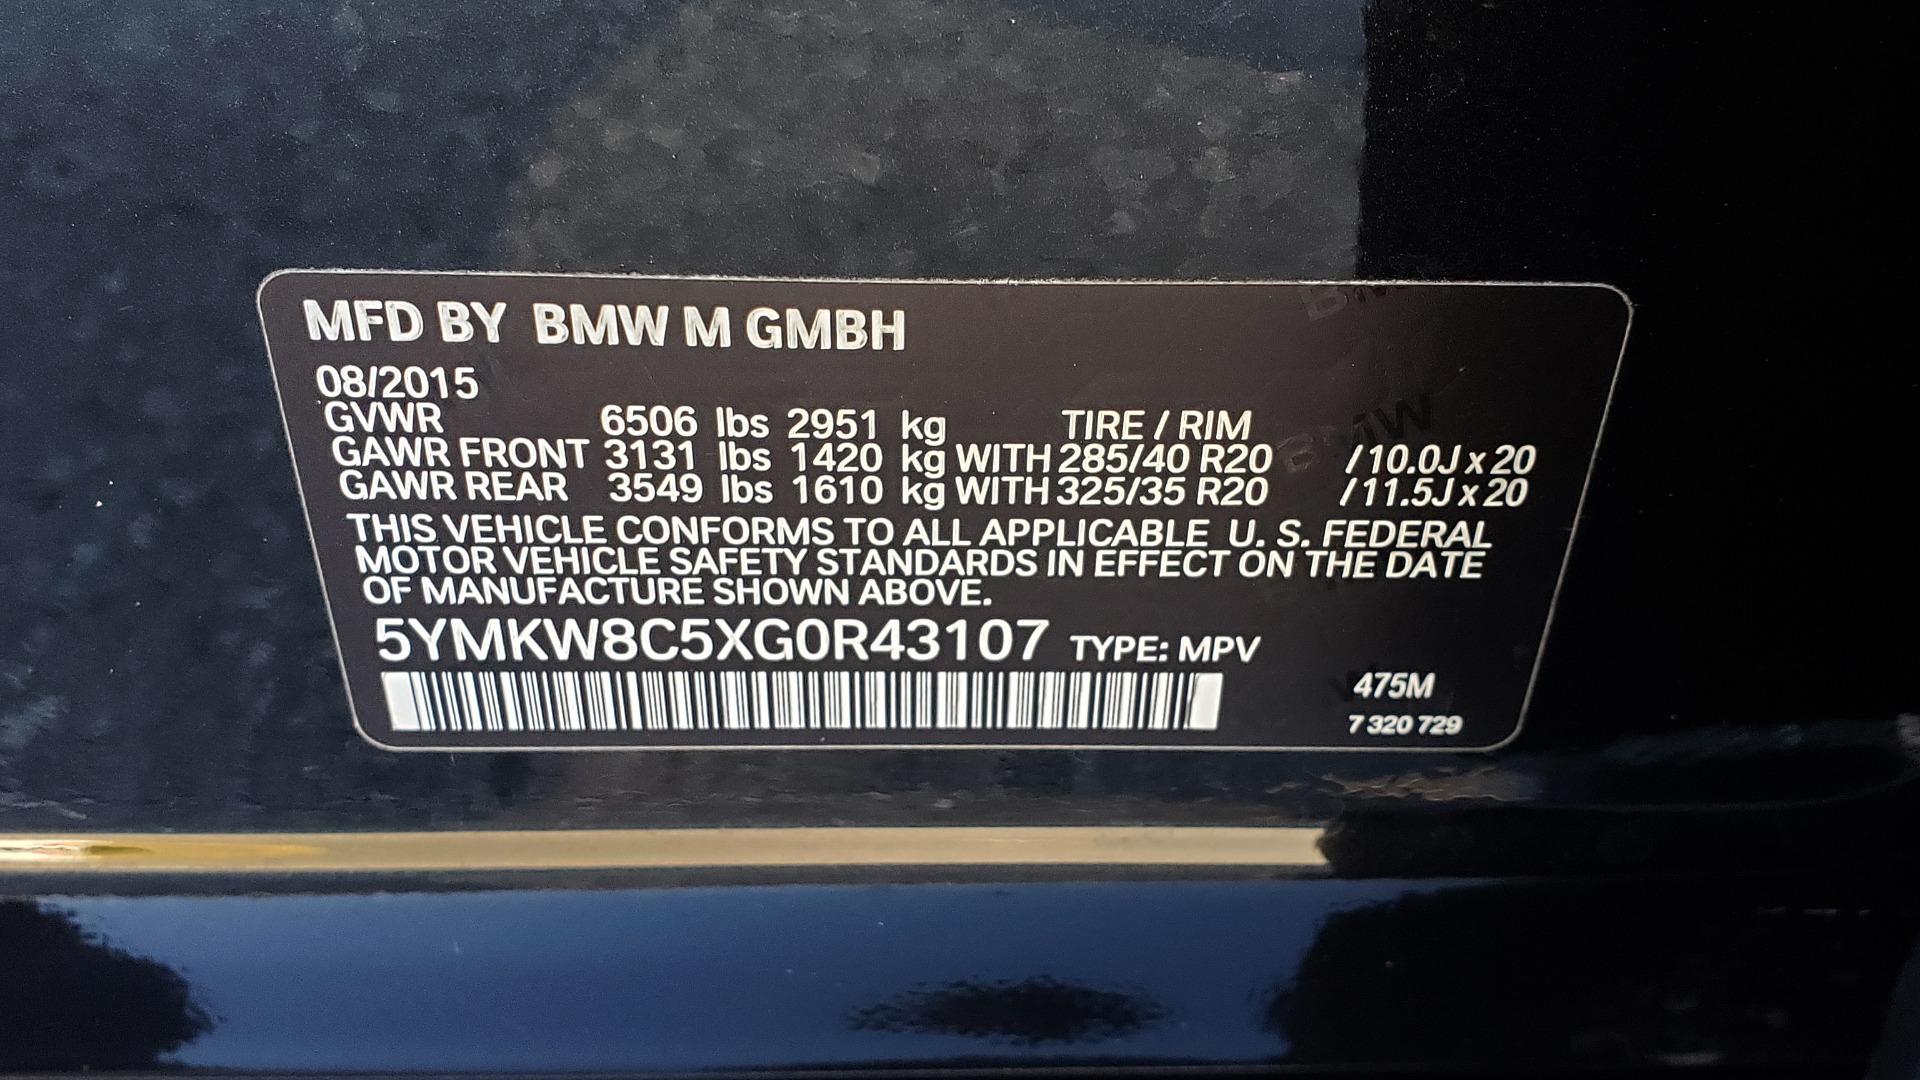 Used 2016 BMW X6 M EXEC PKG / DRVR ASST / NAV / SUNROOF / BLIND SPOT / REARVIEW for sale Sold at Formula Imports in Charlotte NC 28227 97